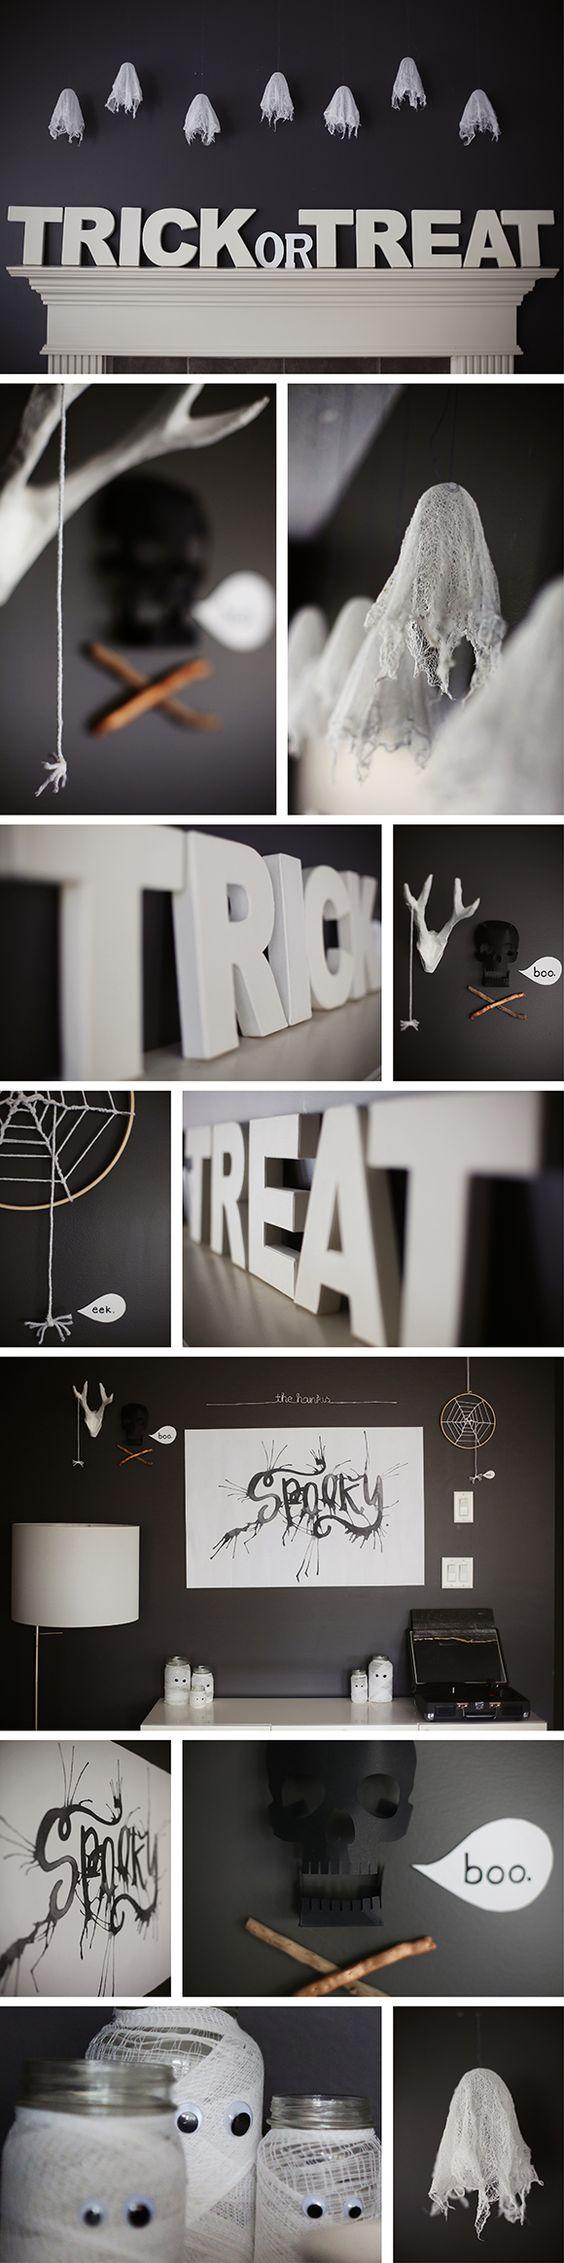 Halloween door decorations mummy downloader - Pinksugarland Halloween 2014 1